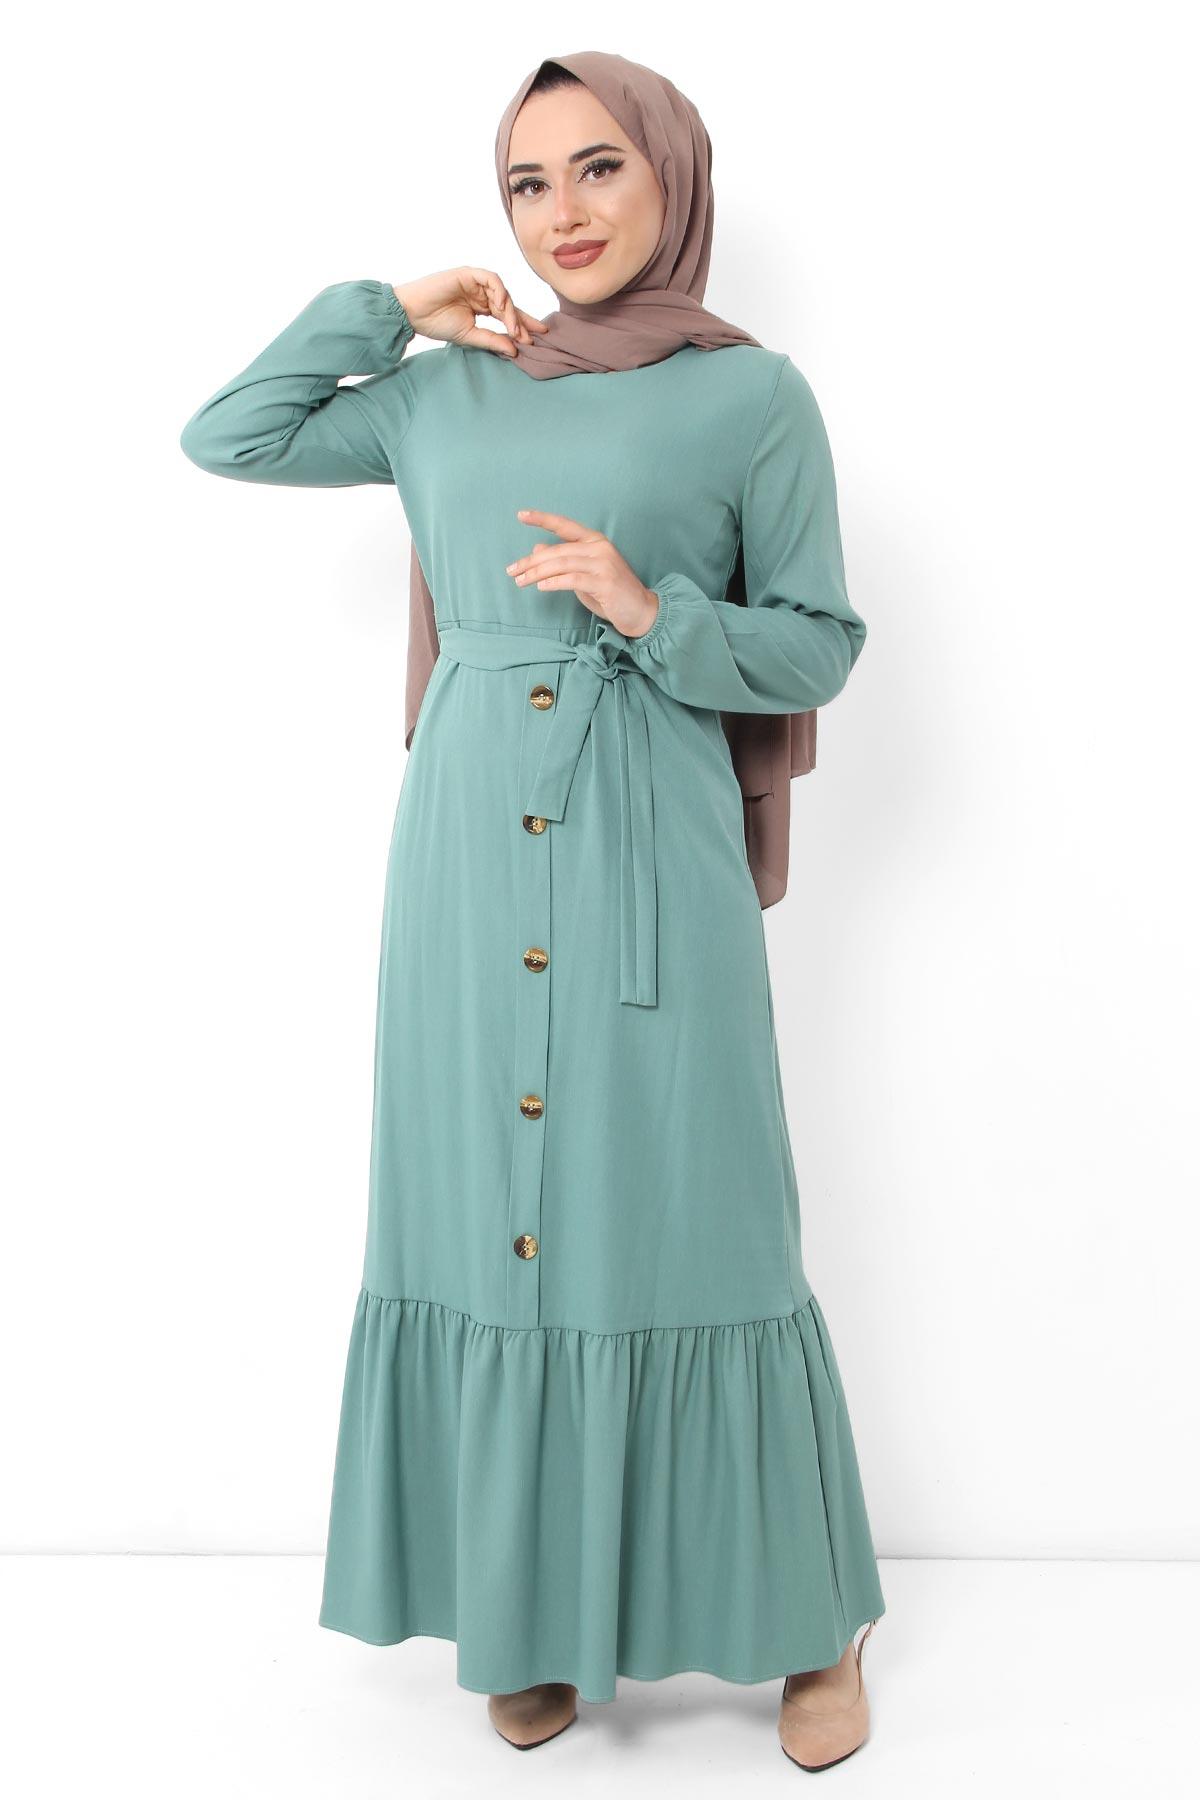 Ornement bouton volants Hijab robe TSD0472 neuf